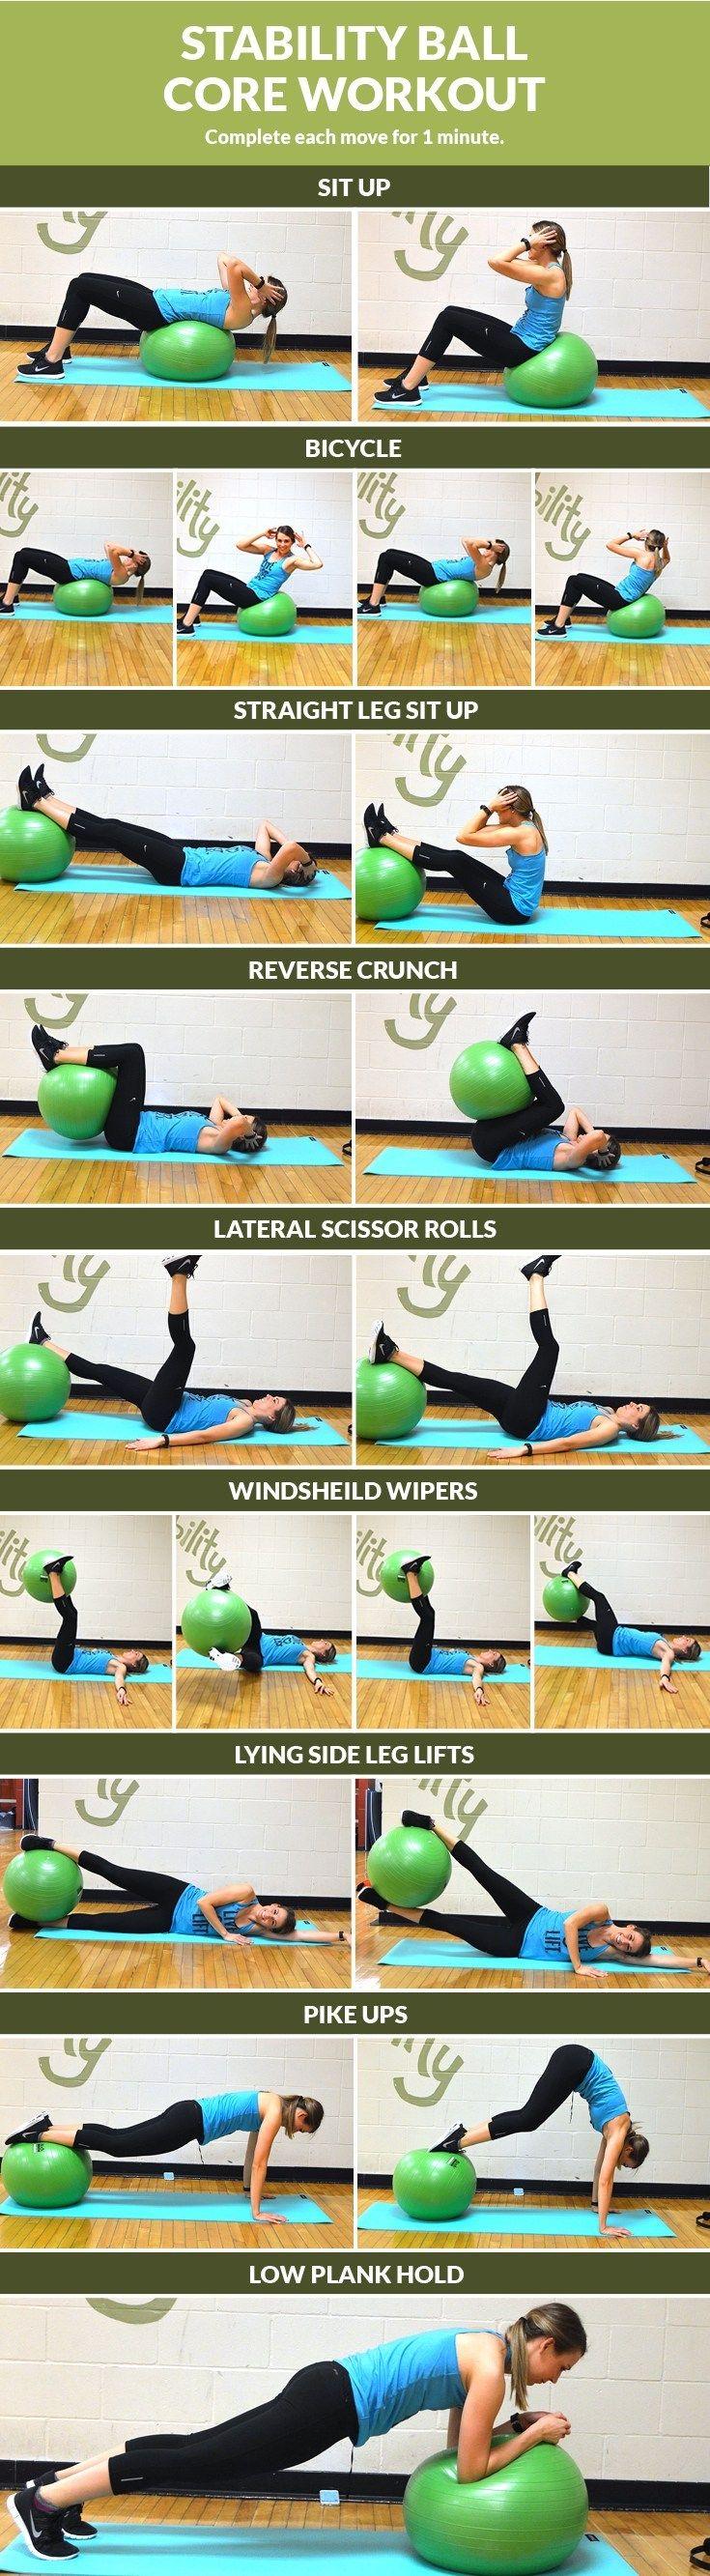 Stability Ball Core Workout - Afitcado